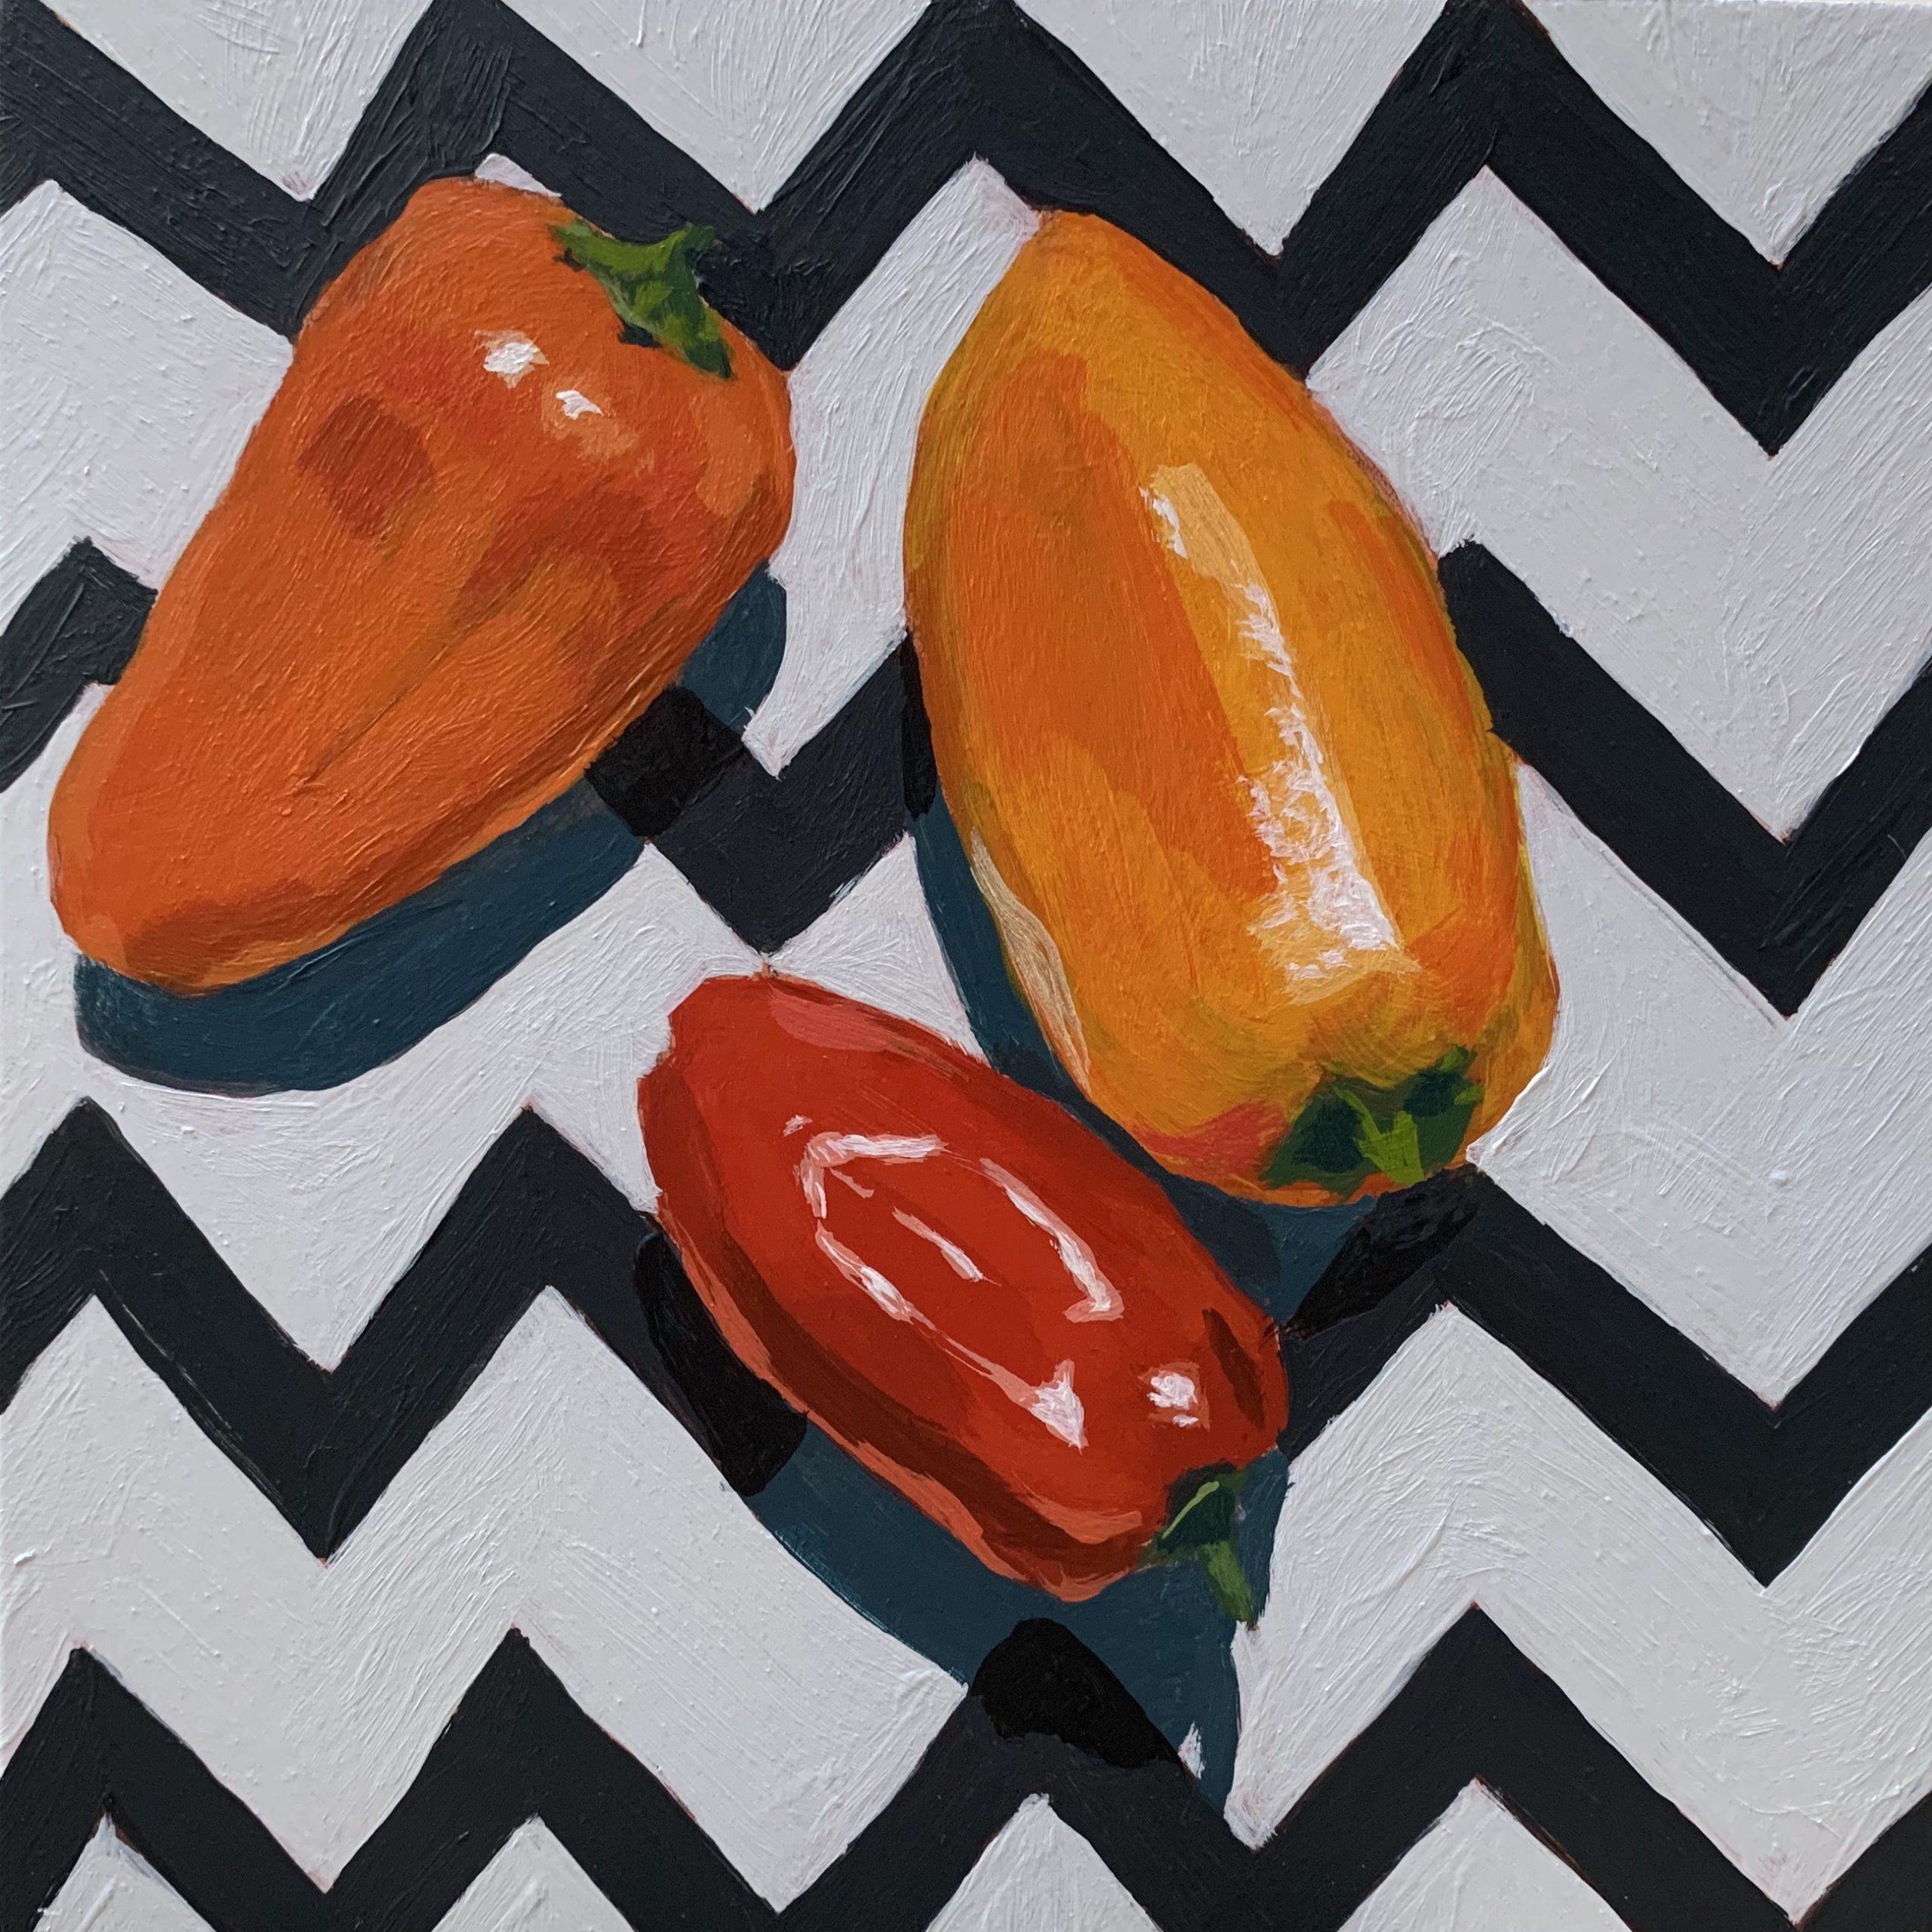 original acrylic painting, original artwork for sale, peppers, chevron, Austin artists, Leigh Ann Torres